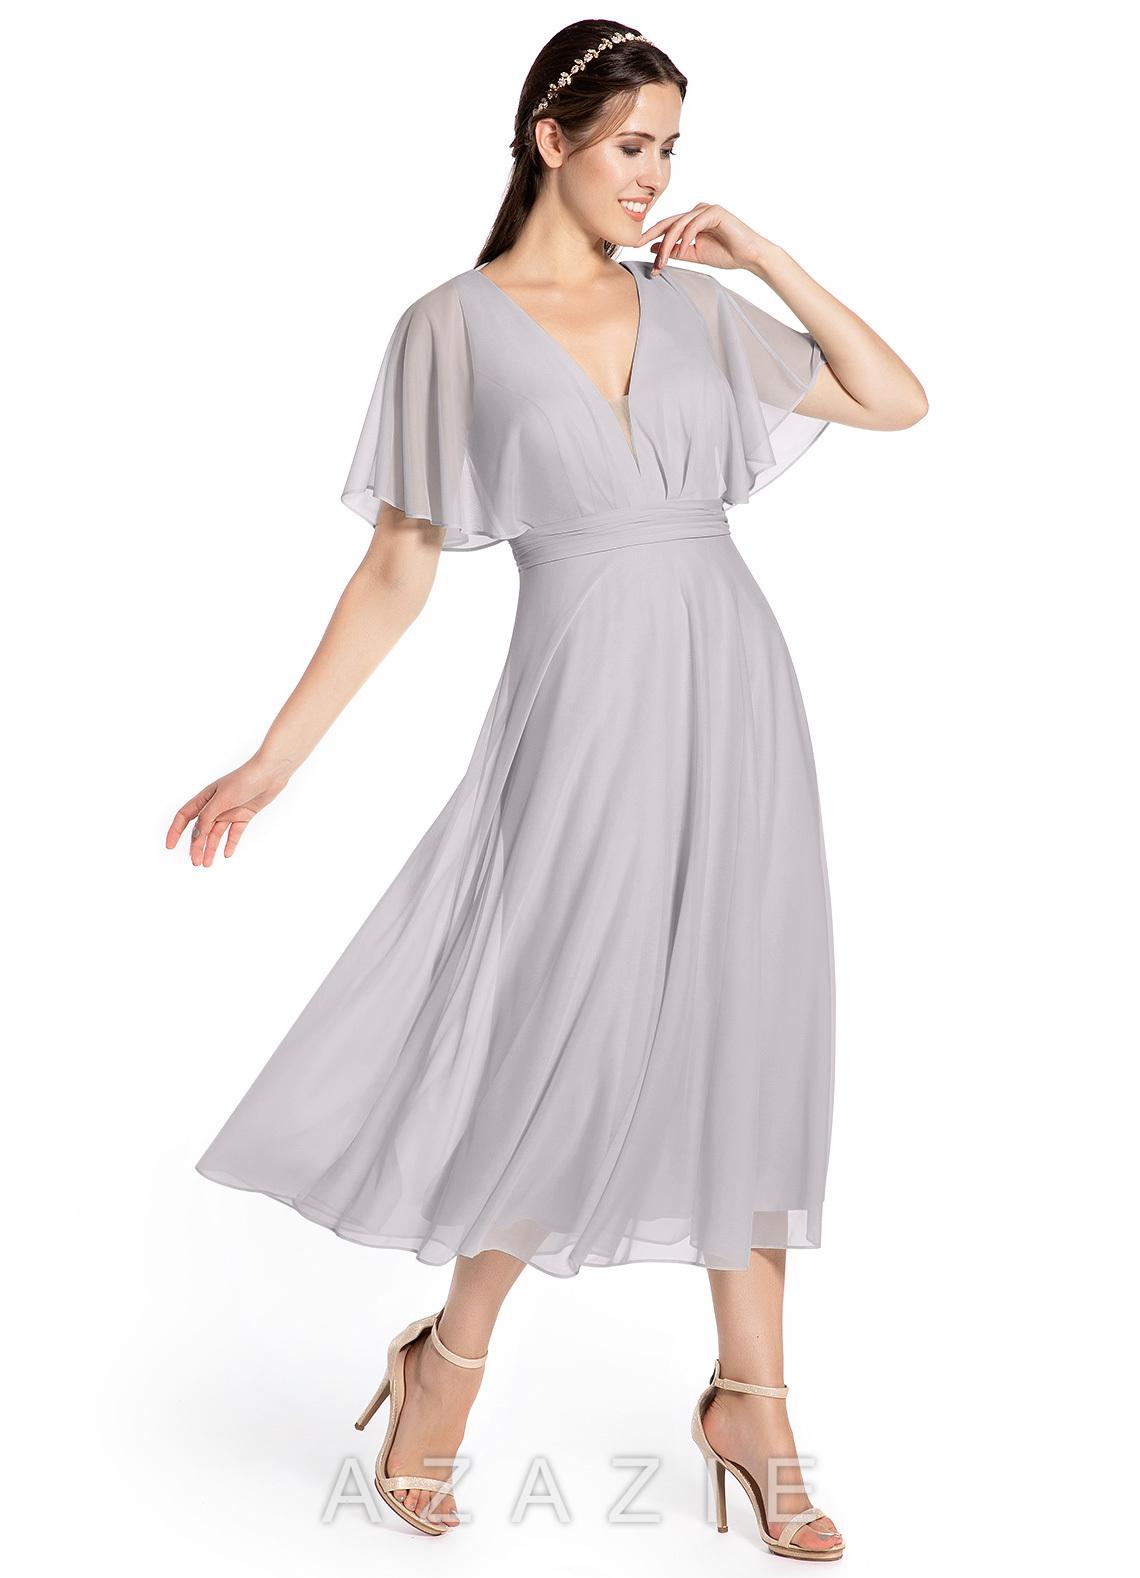 ac25fe7a7304c Azazie Tinsley Bridesmaid Dress | Azazie